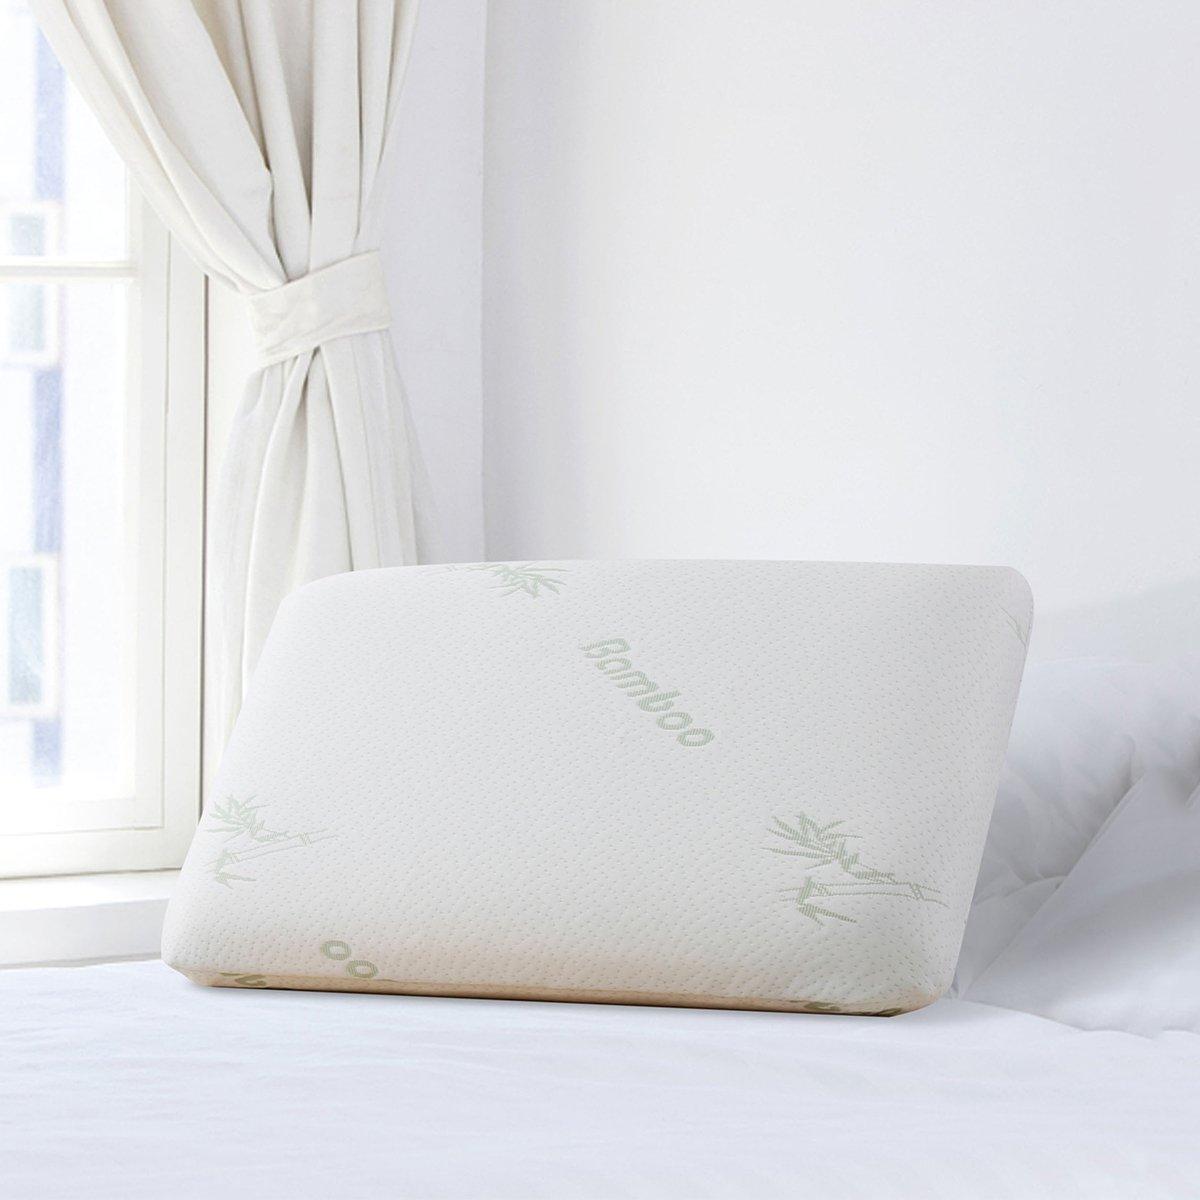 Ramada慢回弹太空记忆棉护颈椎枕头成人面包记忆枕枕头芯枕芯枕头COLOR白色